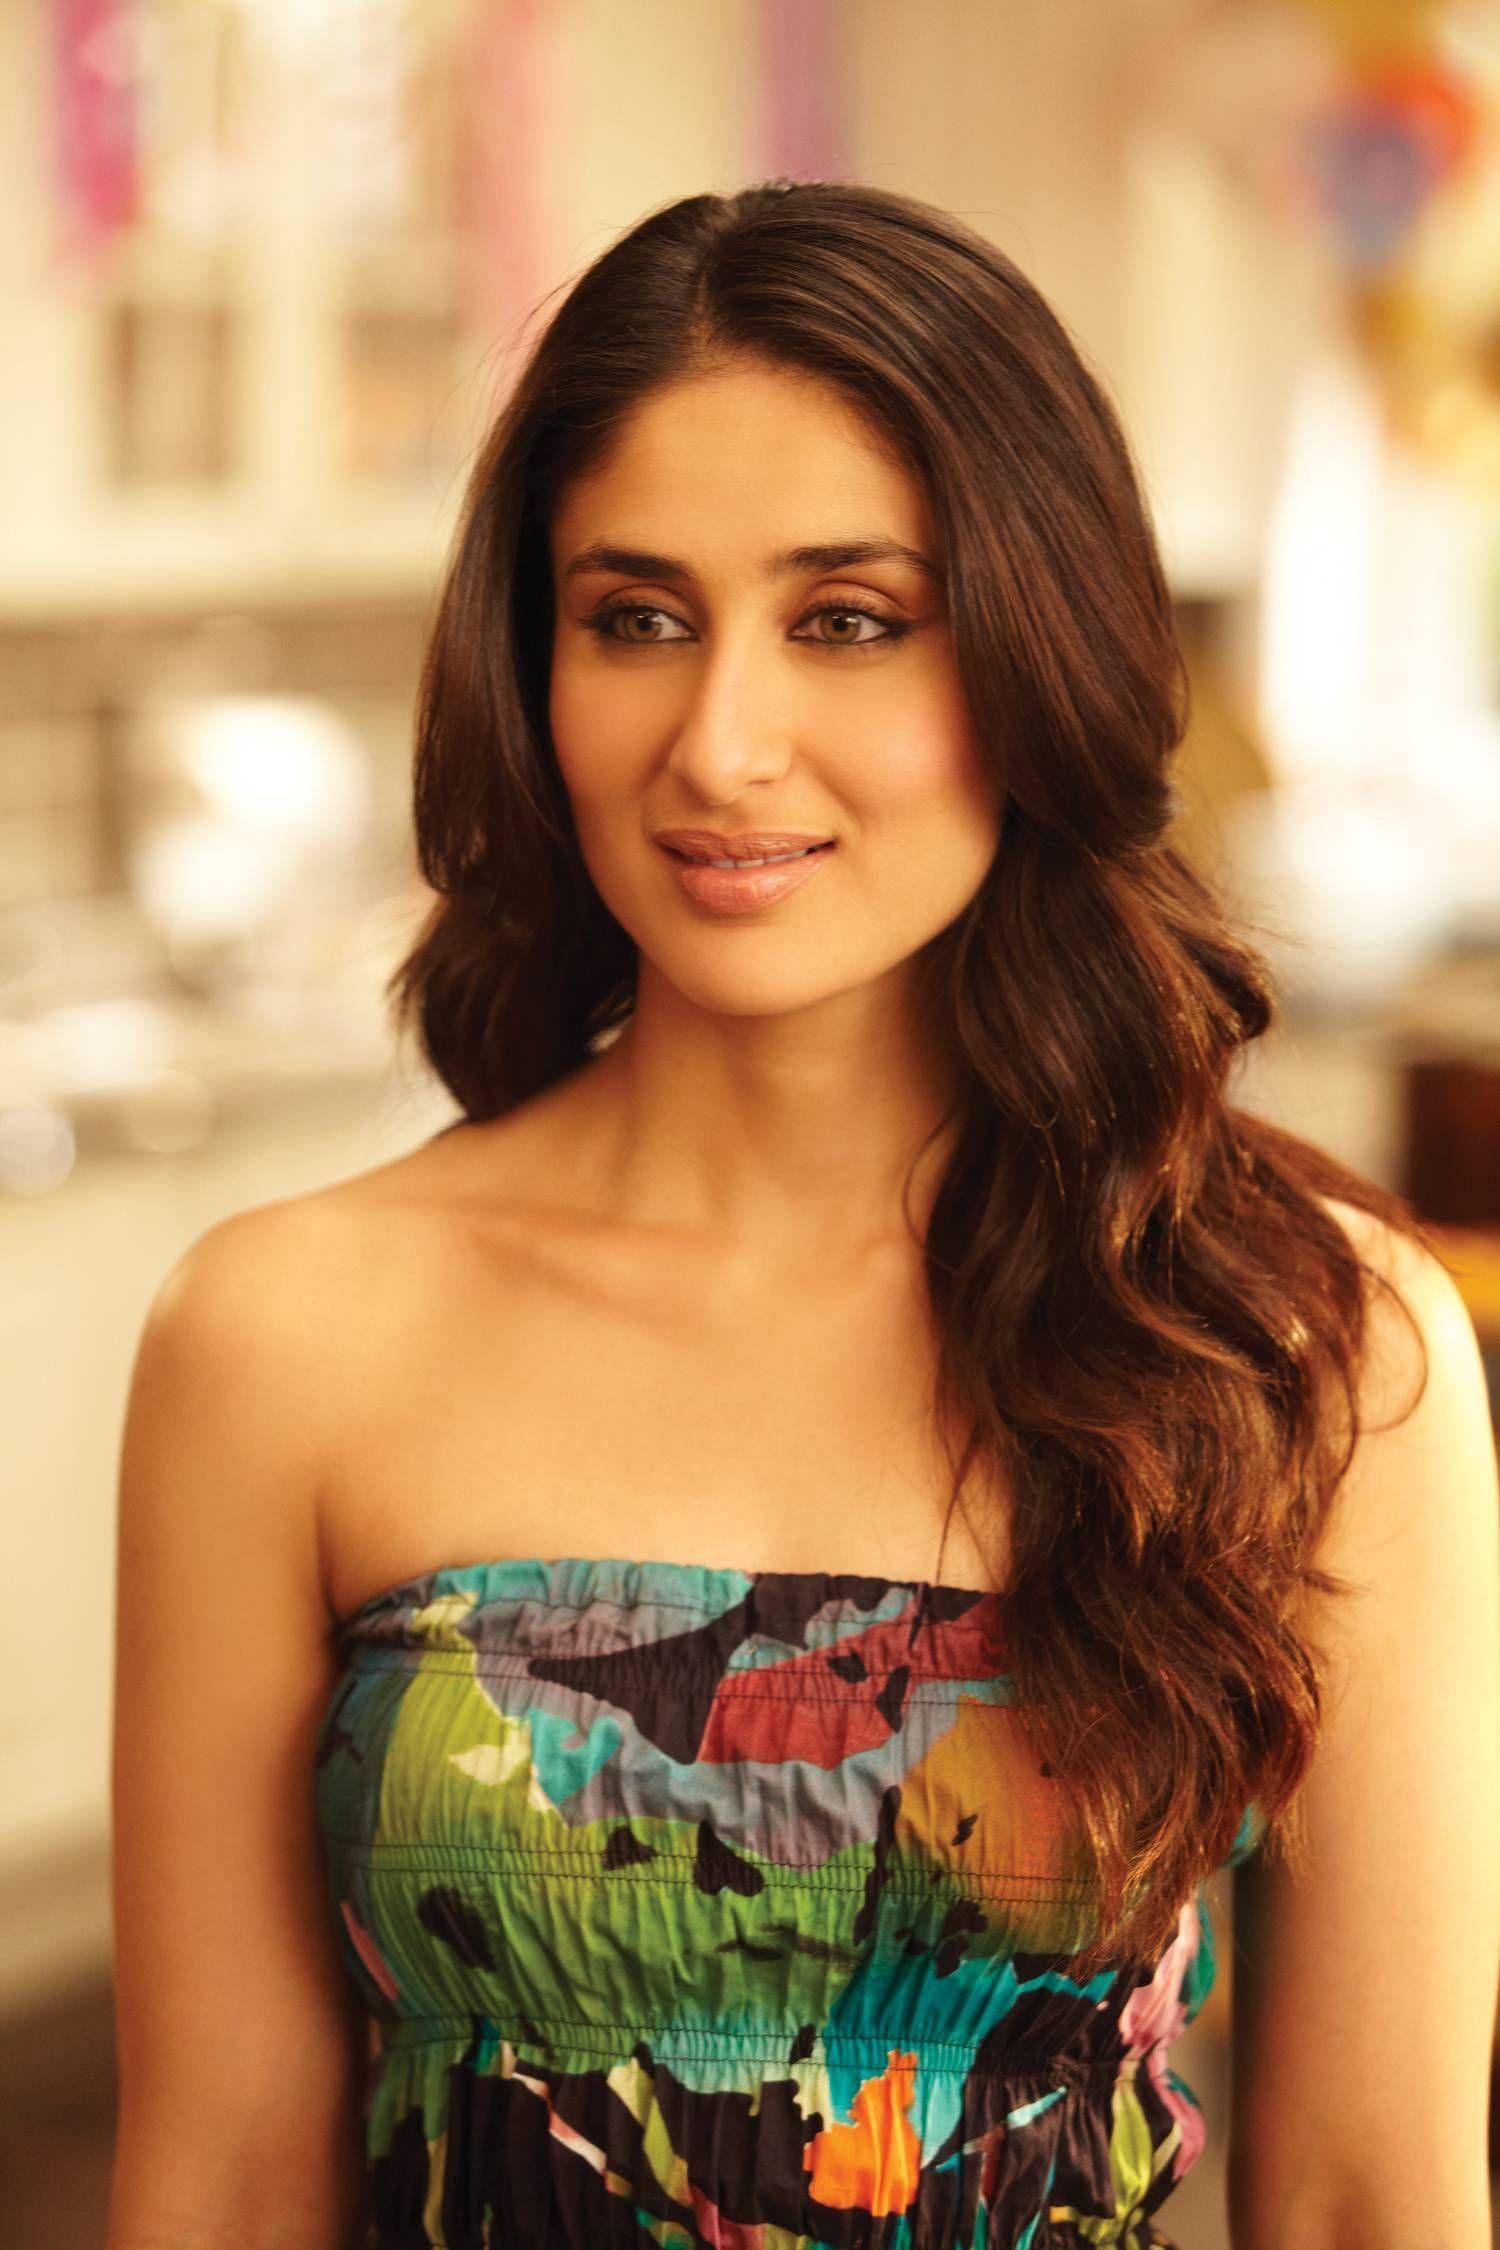 Pin By Umar Akhonzada On Kareena Kapoor Kareena Kapoor Hairstyles Kareena Kapoor Wallpapers Most Beautiful Indian Actress